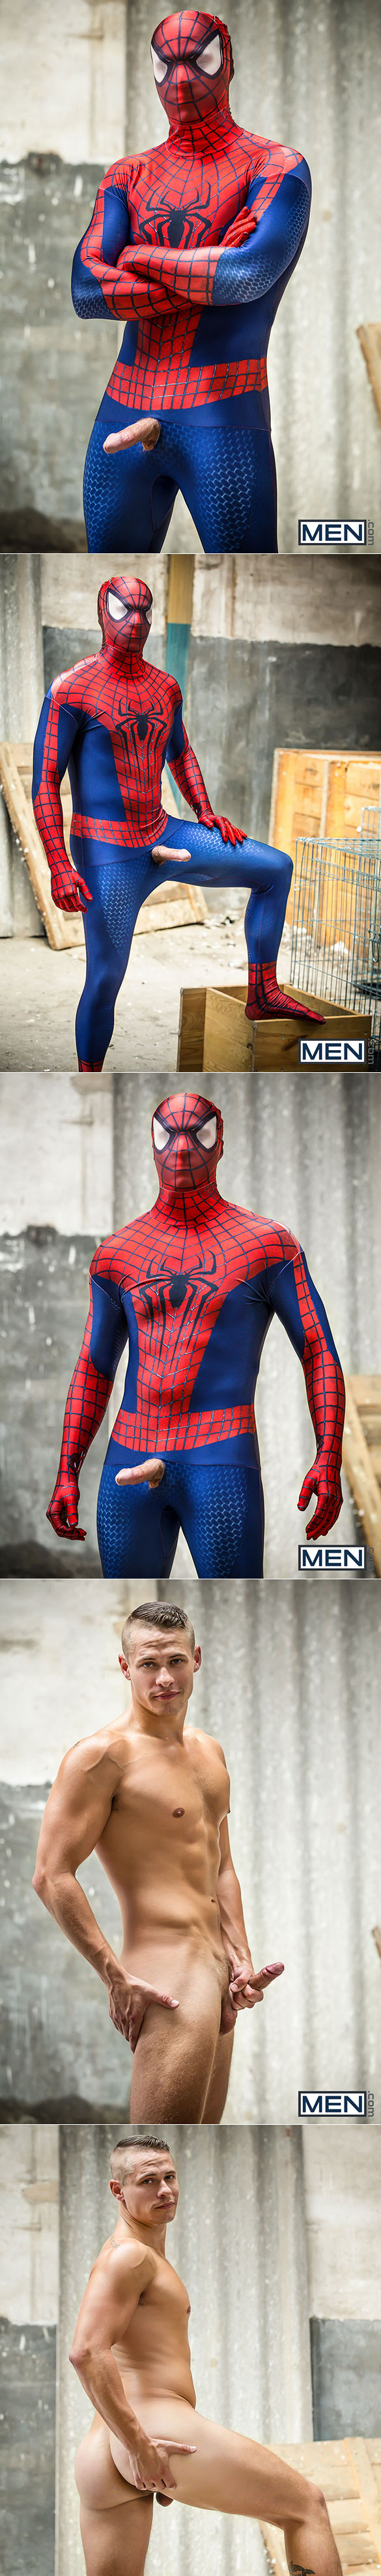 "Men.com: Will Braun fucks Aston Springs in ""Spiderman: A Gay XXX Parody, Part 2"""